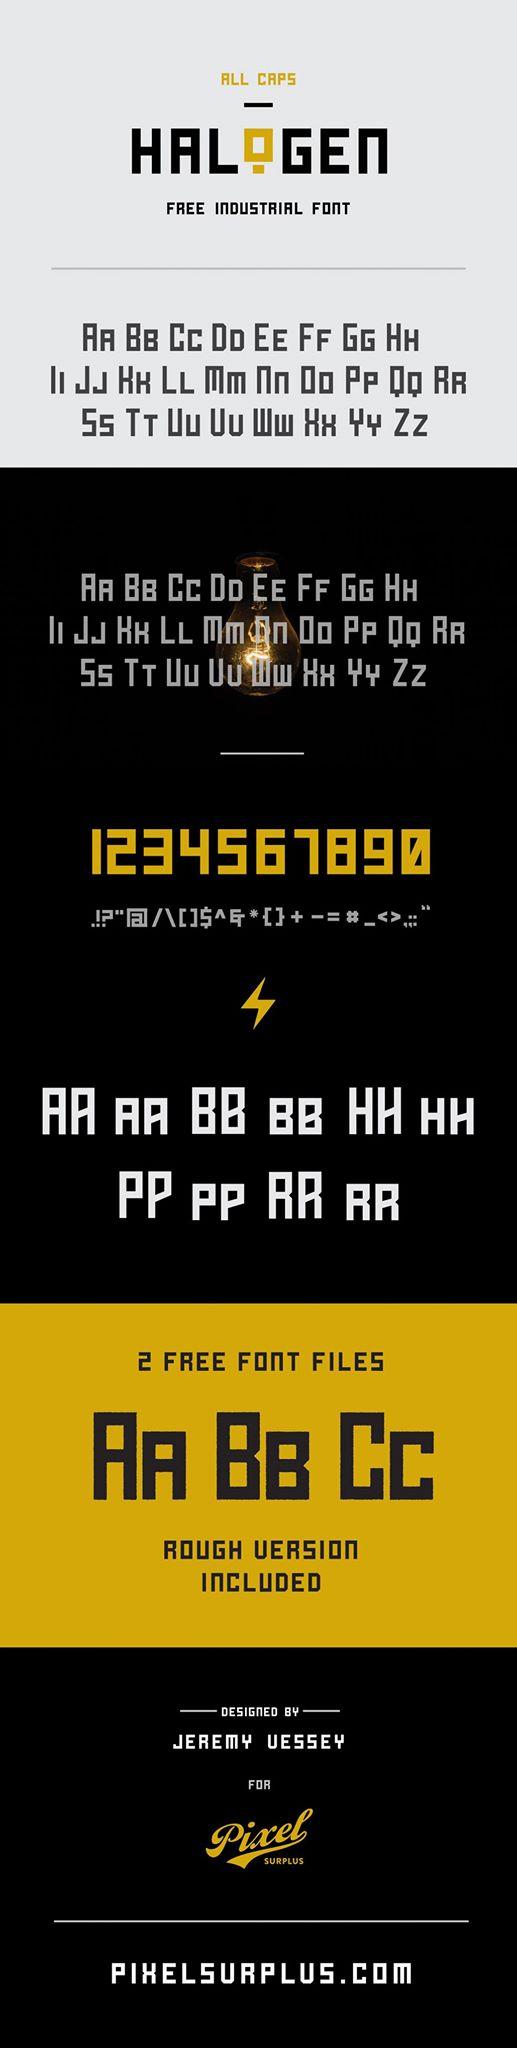 Halogen-Free-Bold-Industrial-Typeface